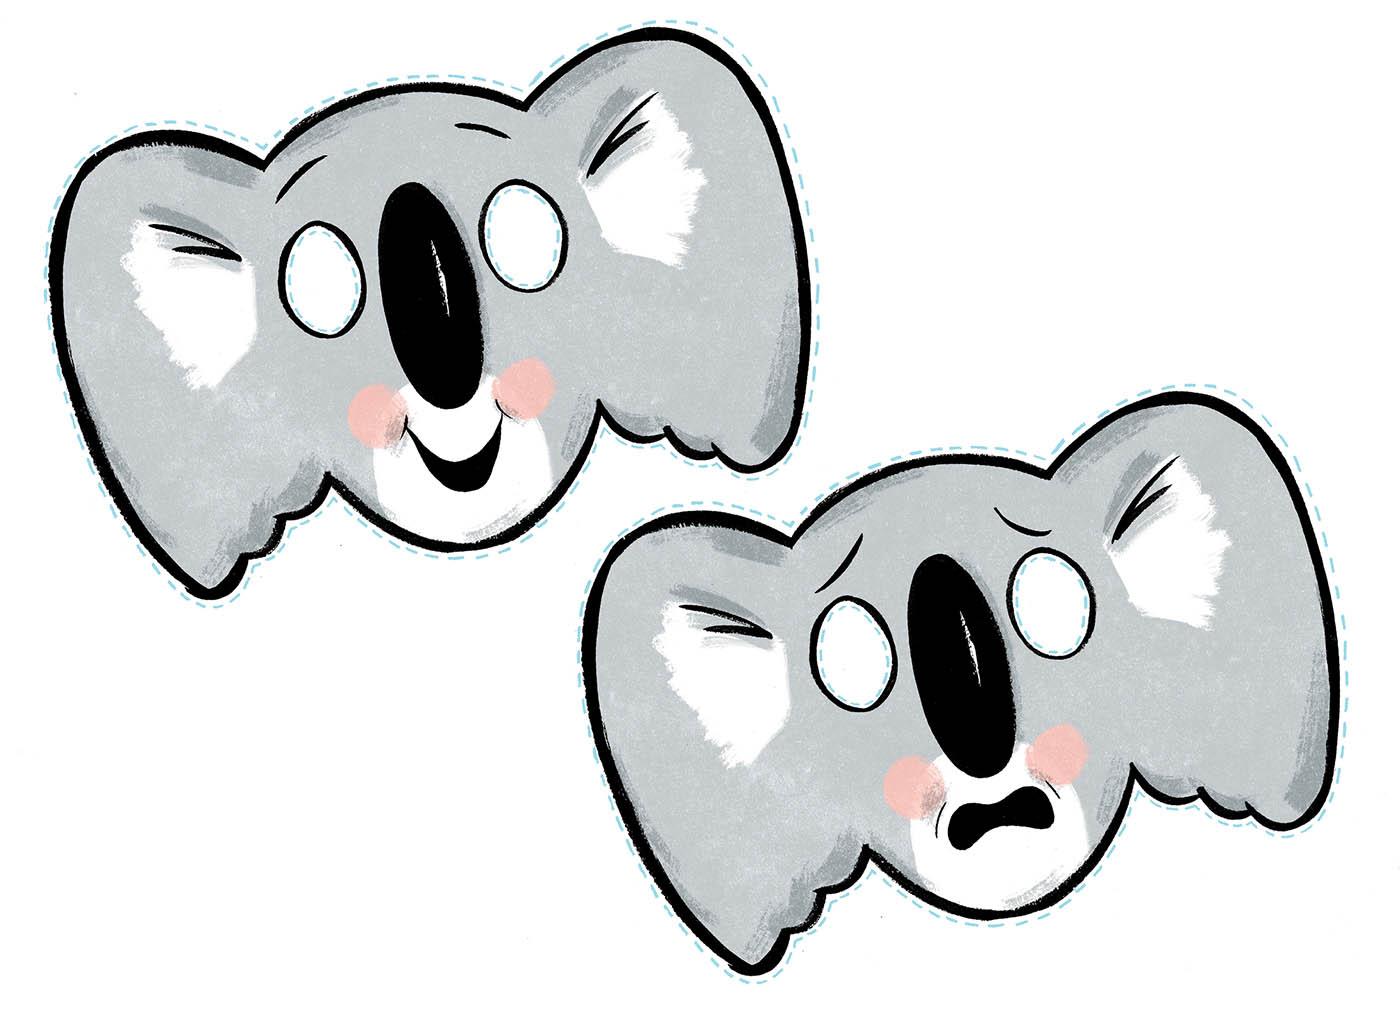 Koala masks - comedy and tragedy